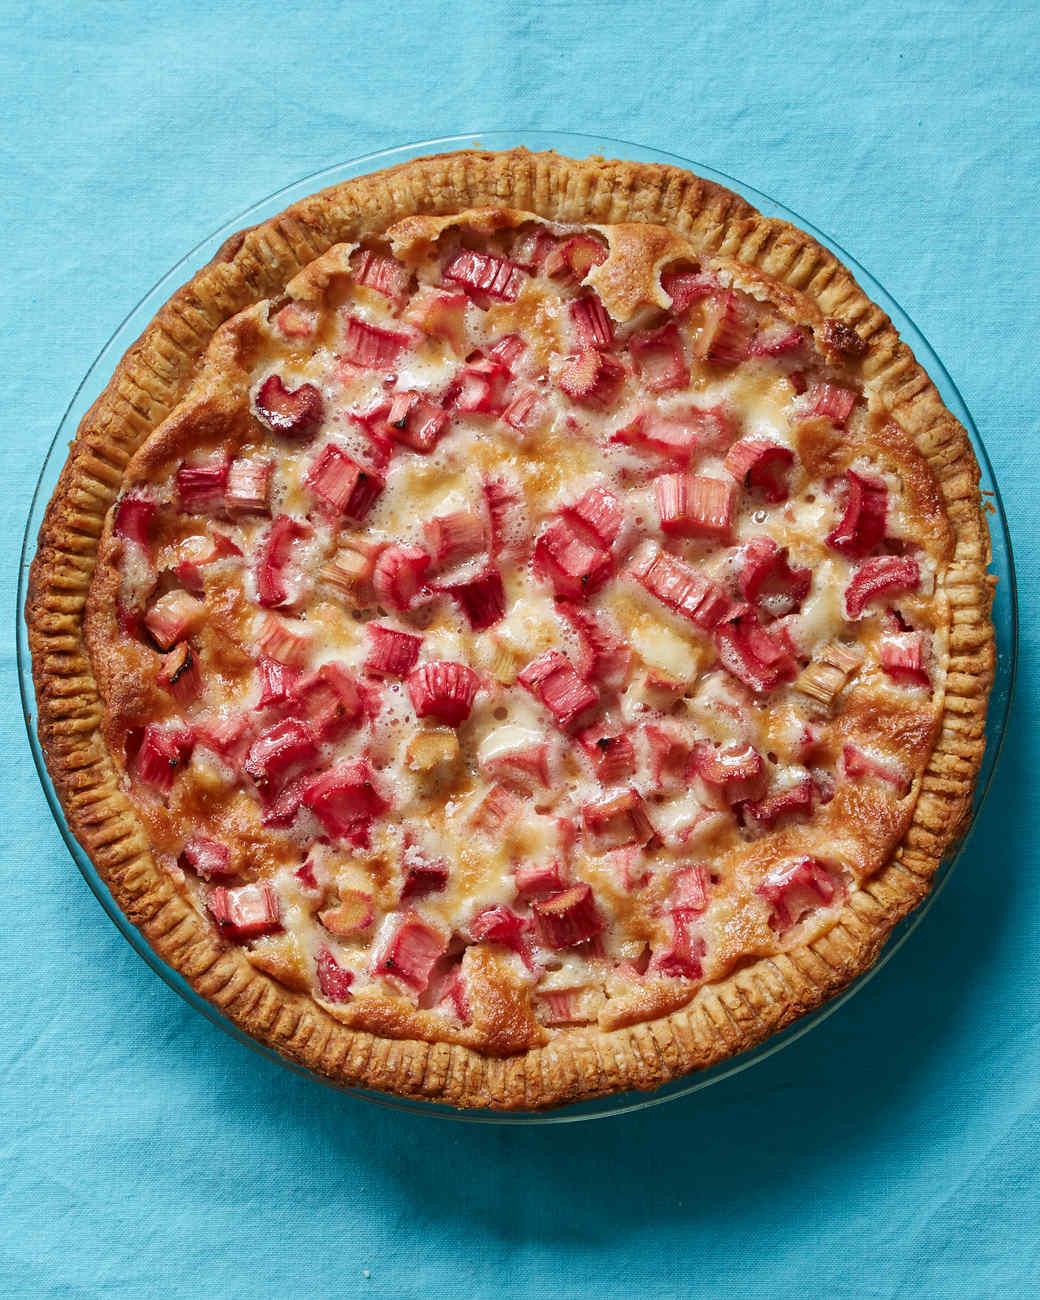 rubarb-cream-pie-1010-d112904.jpg